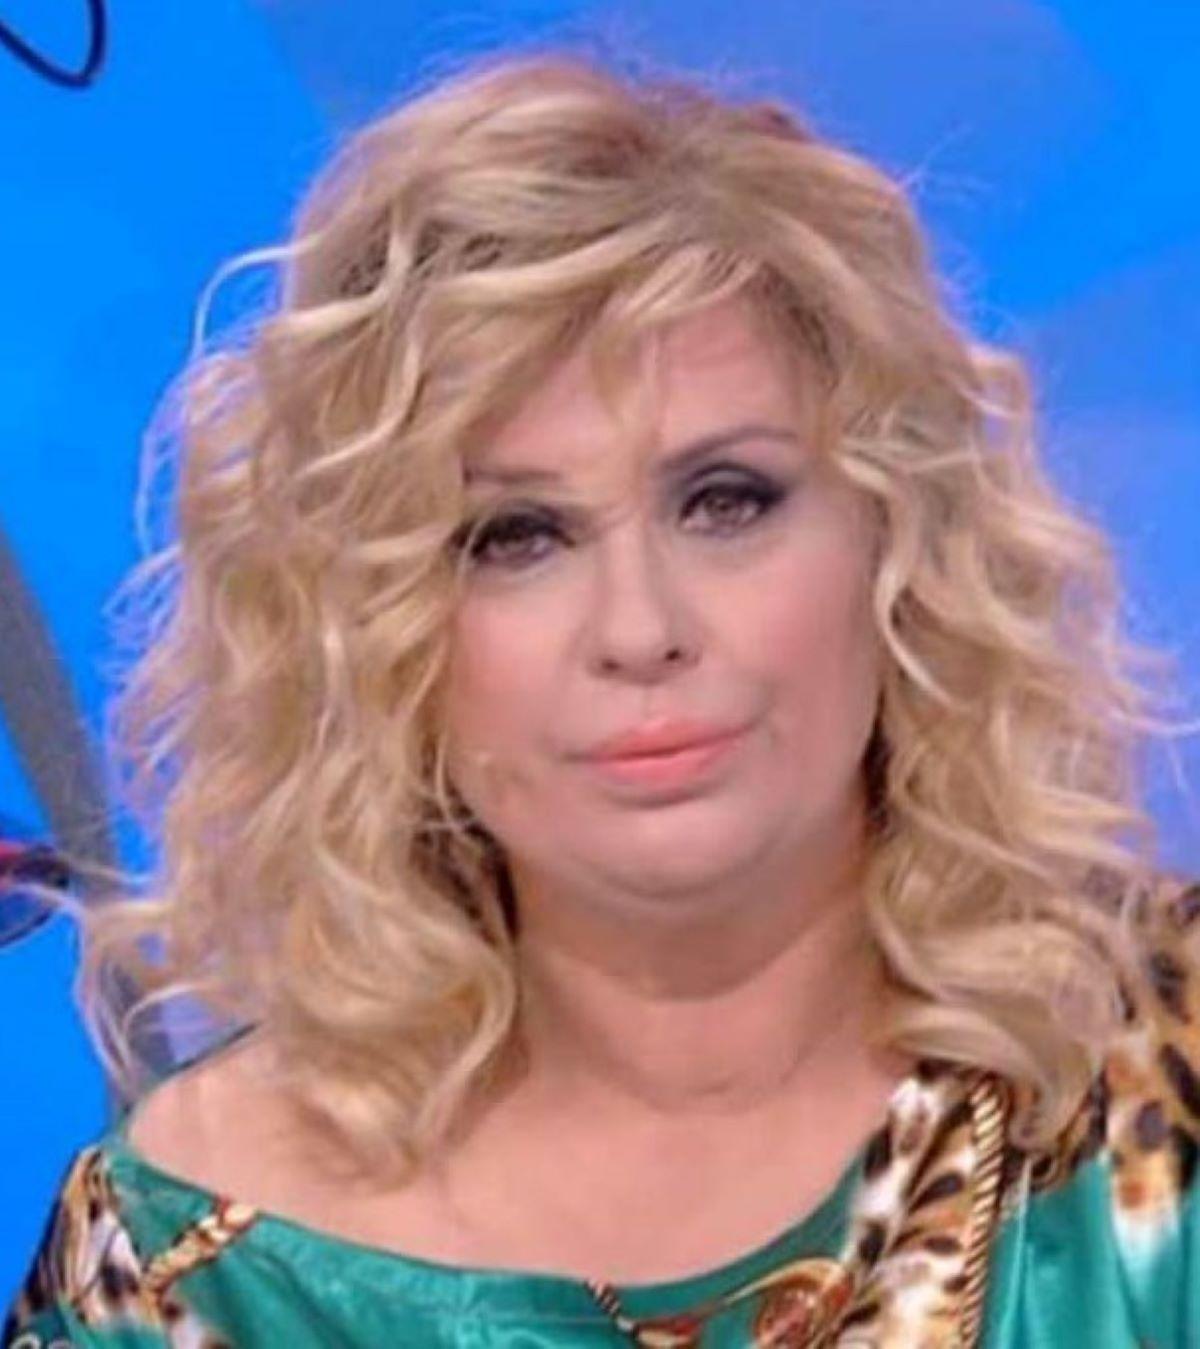 Tina Cipollari Furia Gemma Galgani Uomini e Donne